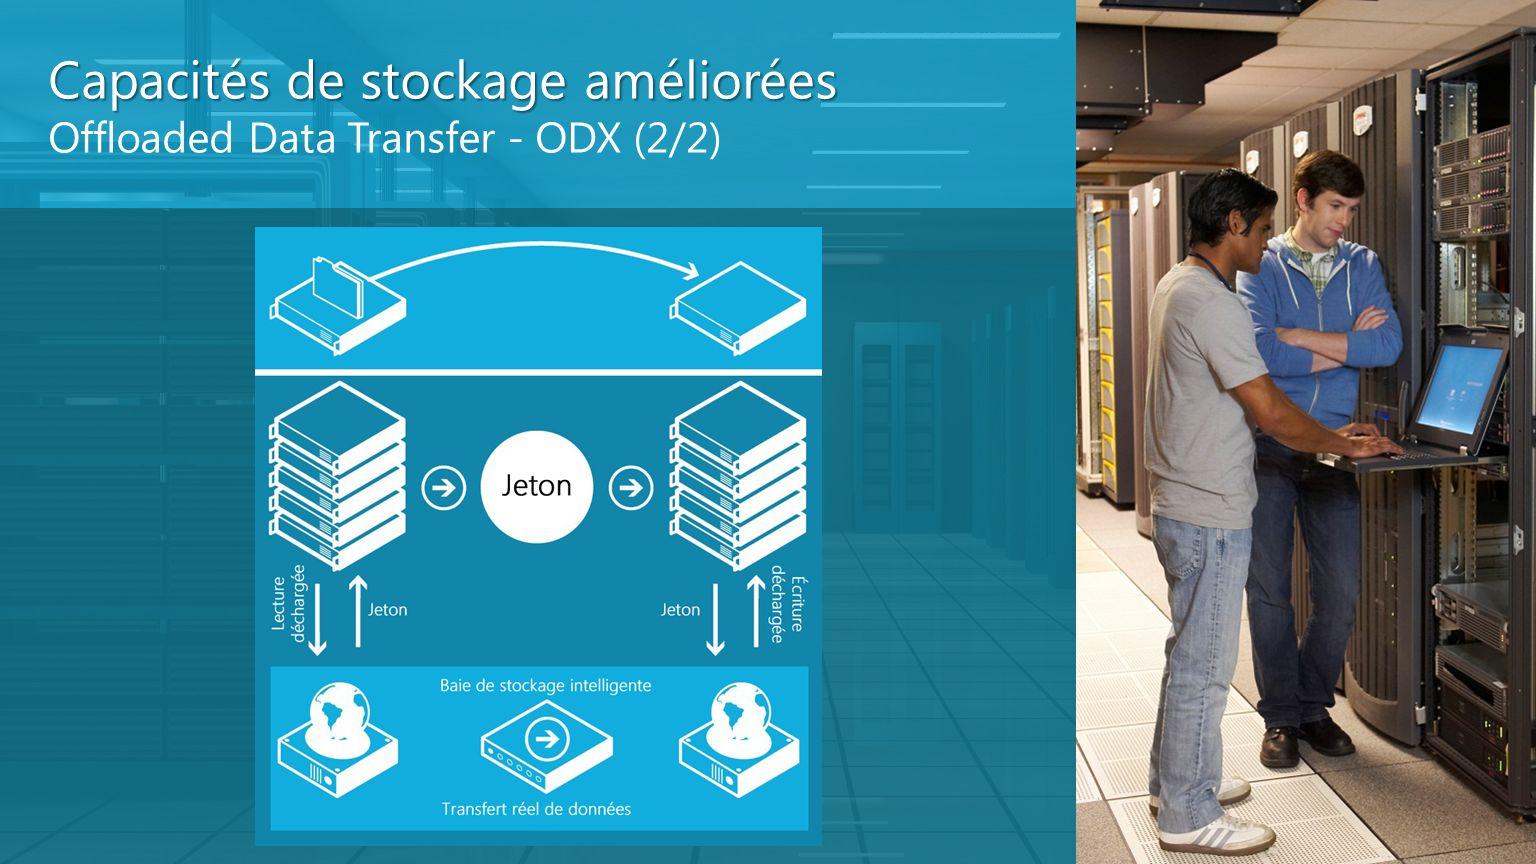 Capacités de stockage améliorées Offloaded Data Transfer - ODX (2/2)